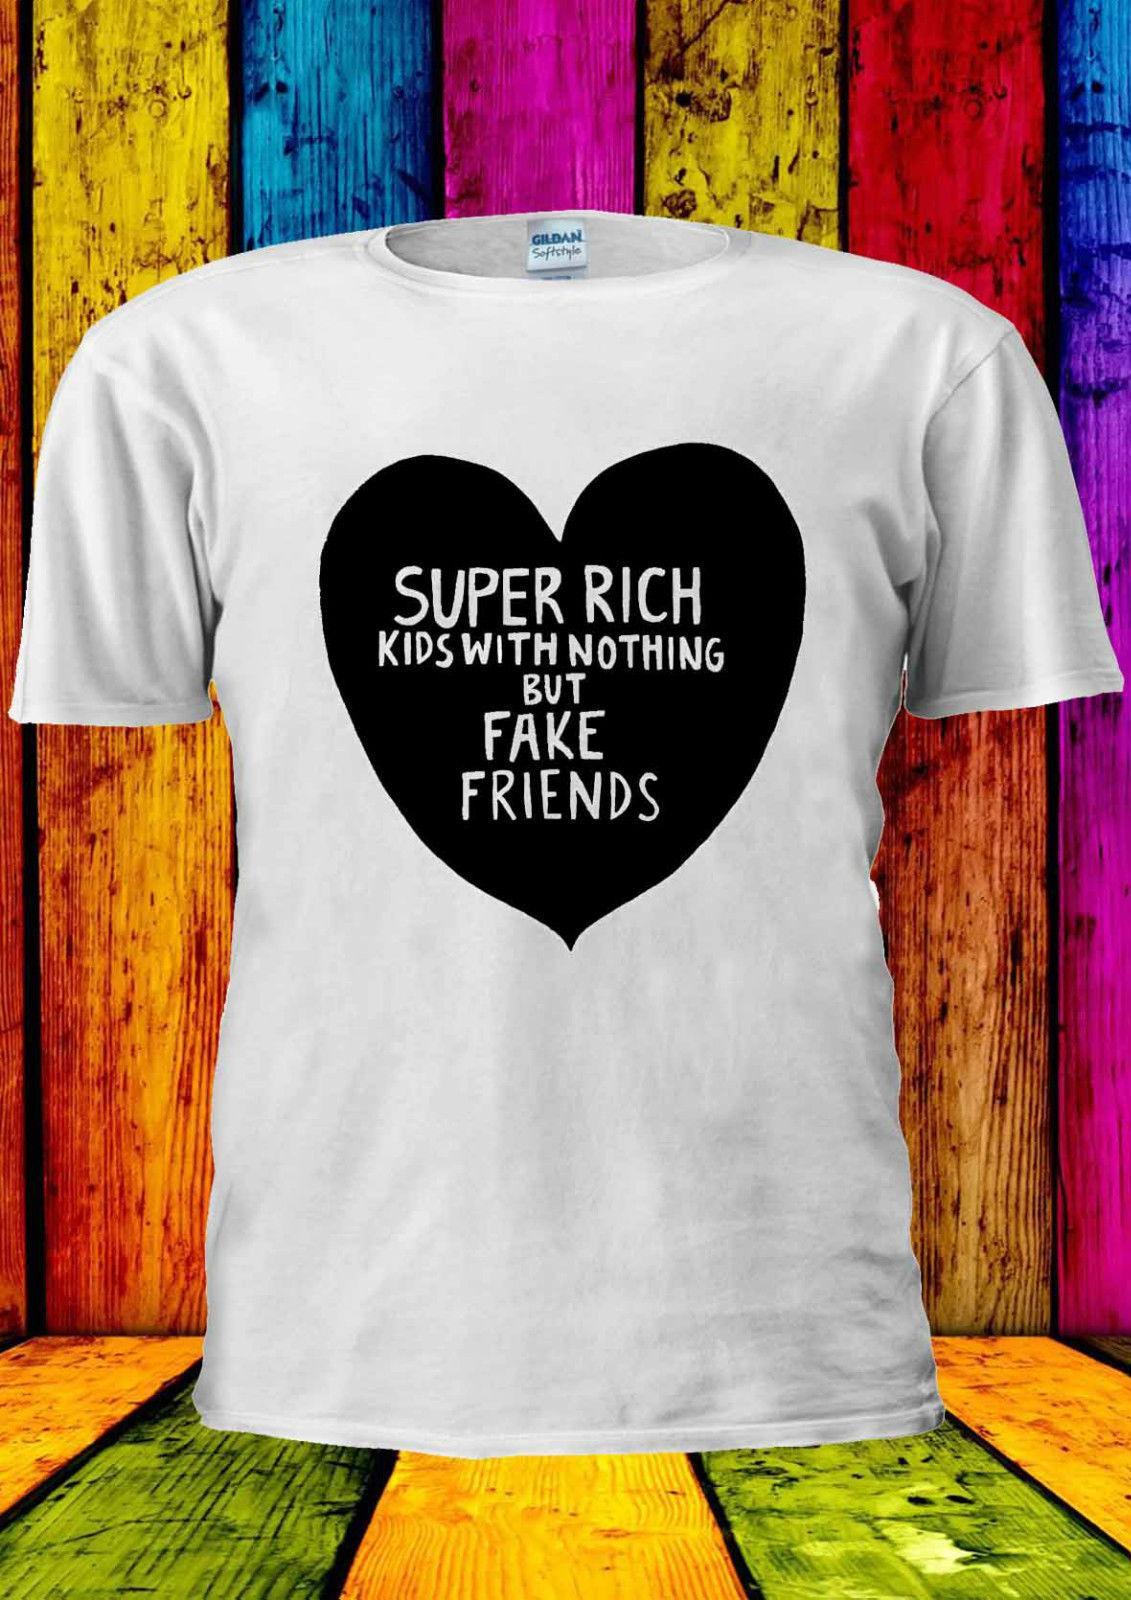 dcfa6e6ca674e Super Rich Kids With Nothing But T-shirt Vest Tank Top Men Women Unisex Top  Free Shipping T-shirt Harajuku Summer 2018 Tshirt